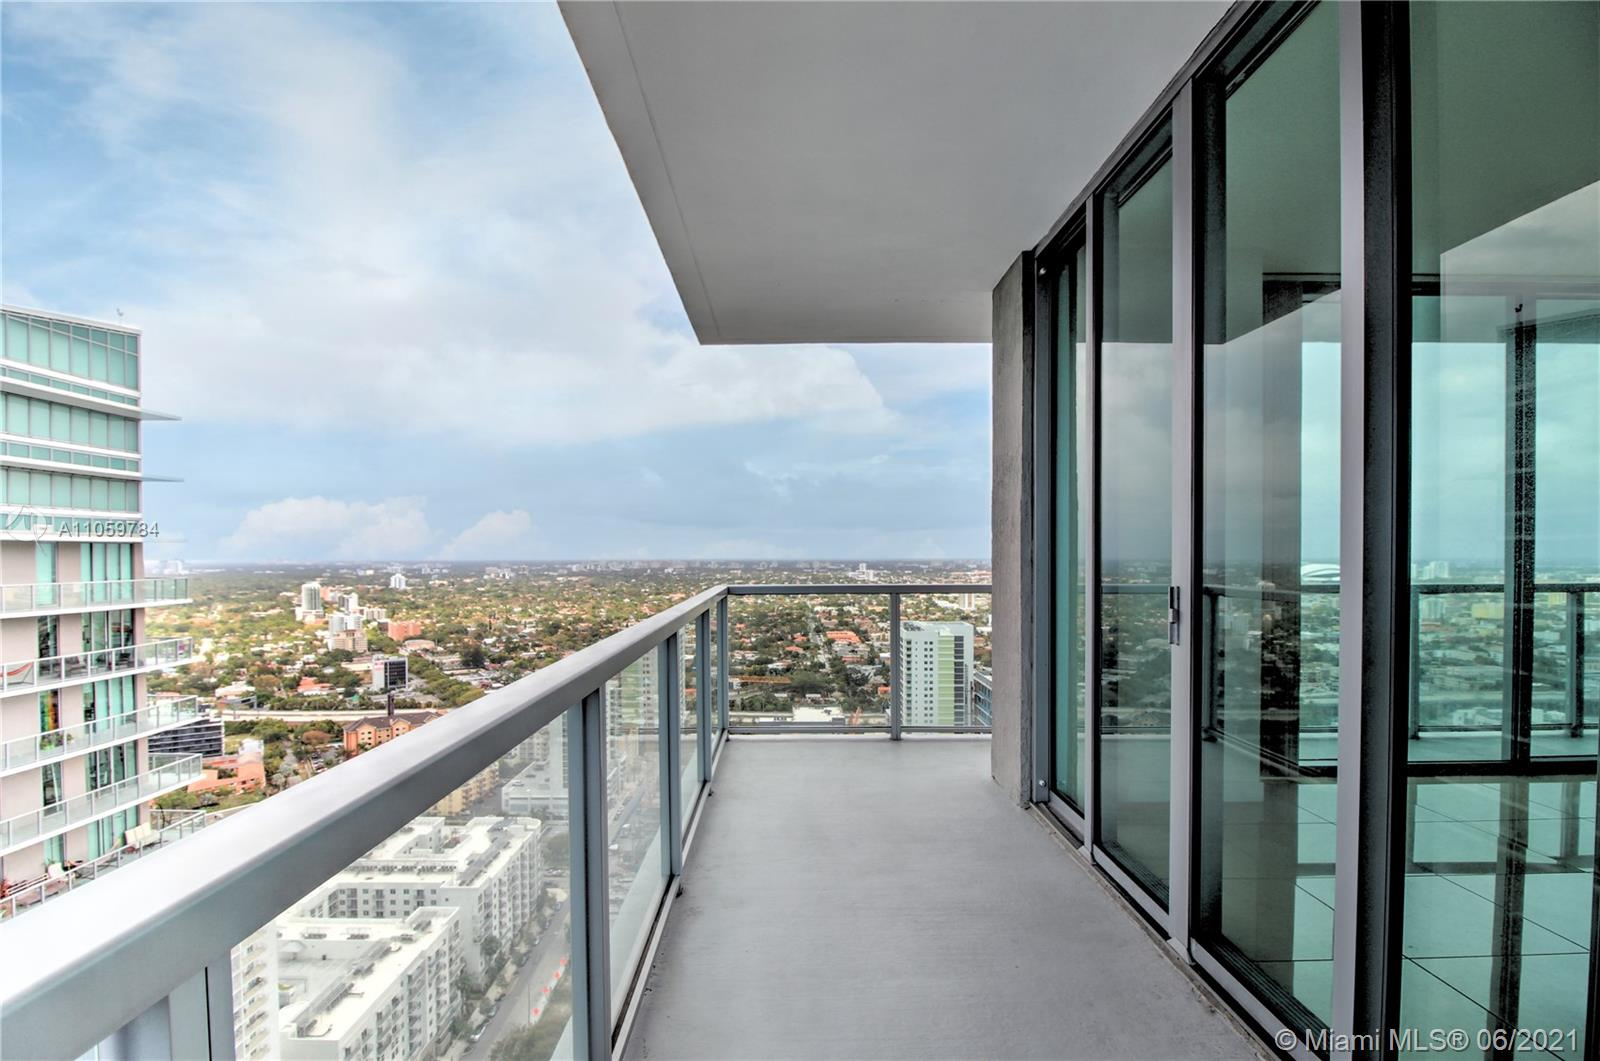 Axis on Brickell North Tower #UPH4014 - 1111 SW 1 AV #UPH4014, Miami, FL 33130